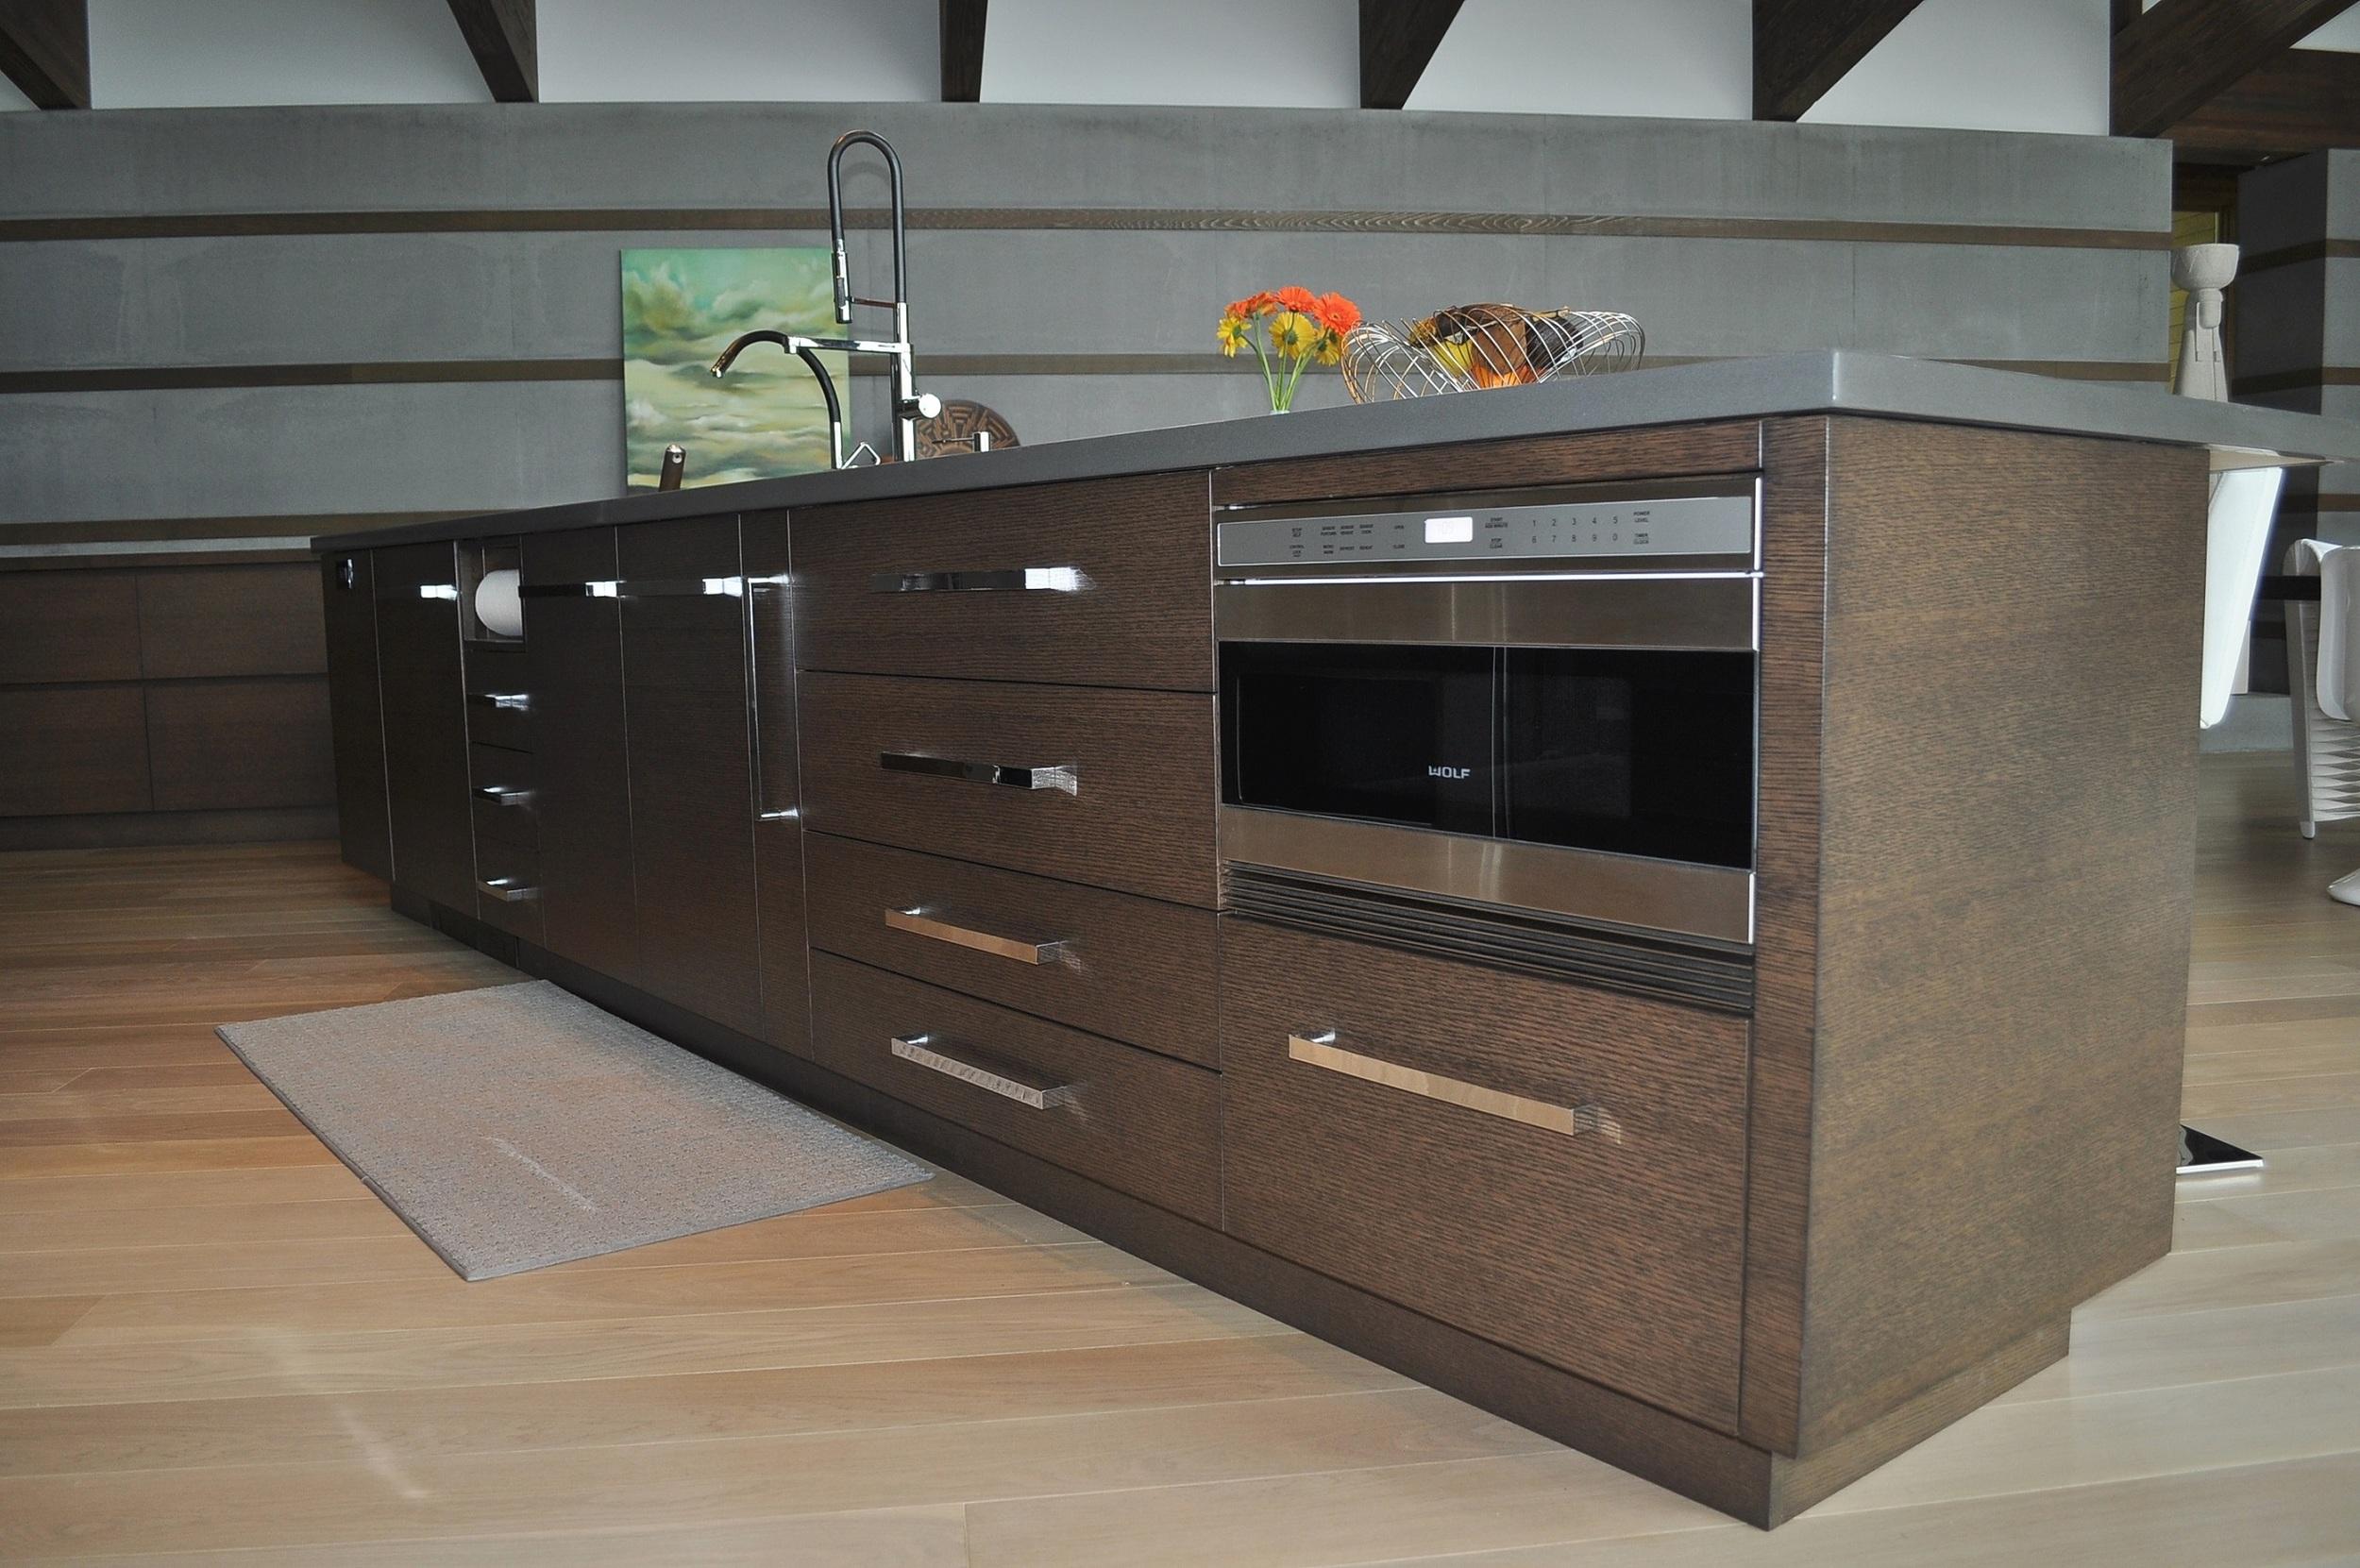 stained-white-oak-custom-kitchen-island-cabinetry.JPG